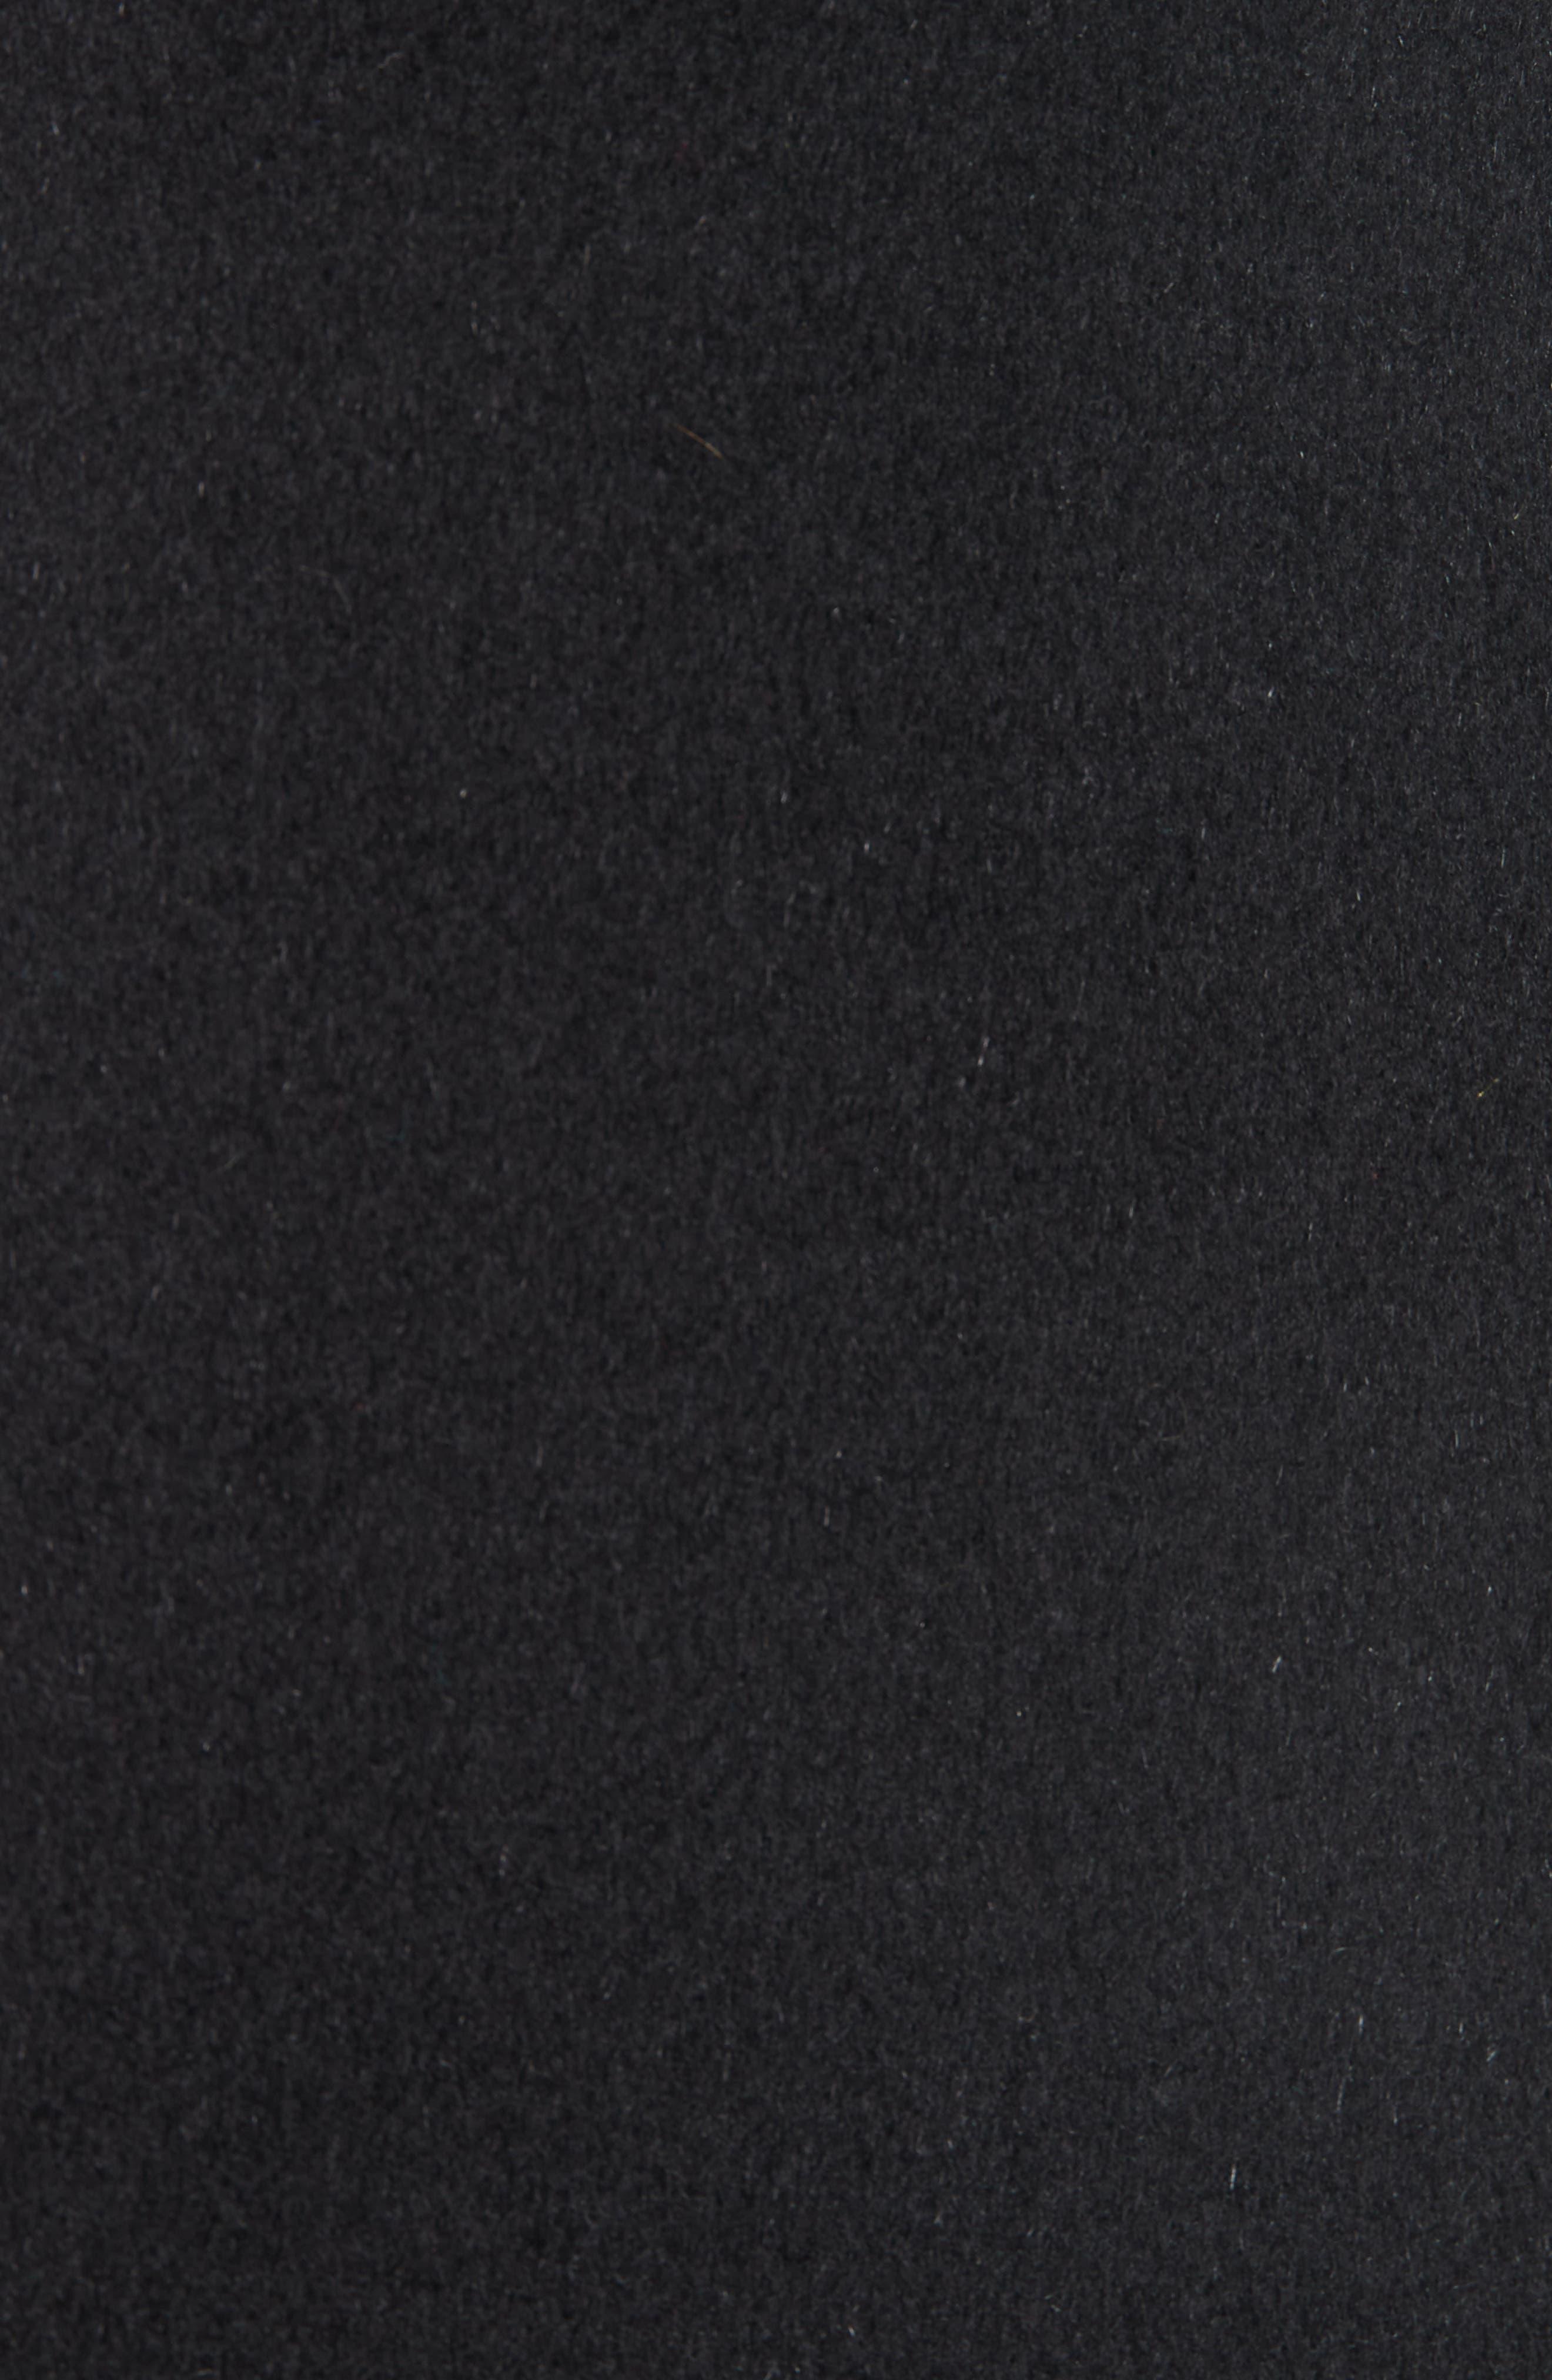 Cookie Studded Wool & Cashgora Jacket,                             Alternate thumbnail 6, color,                             BLACK